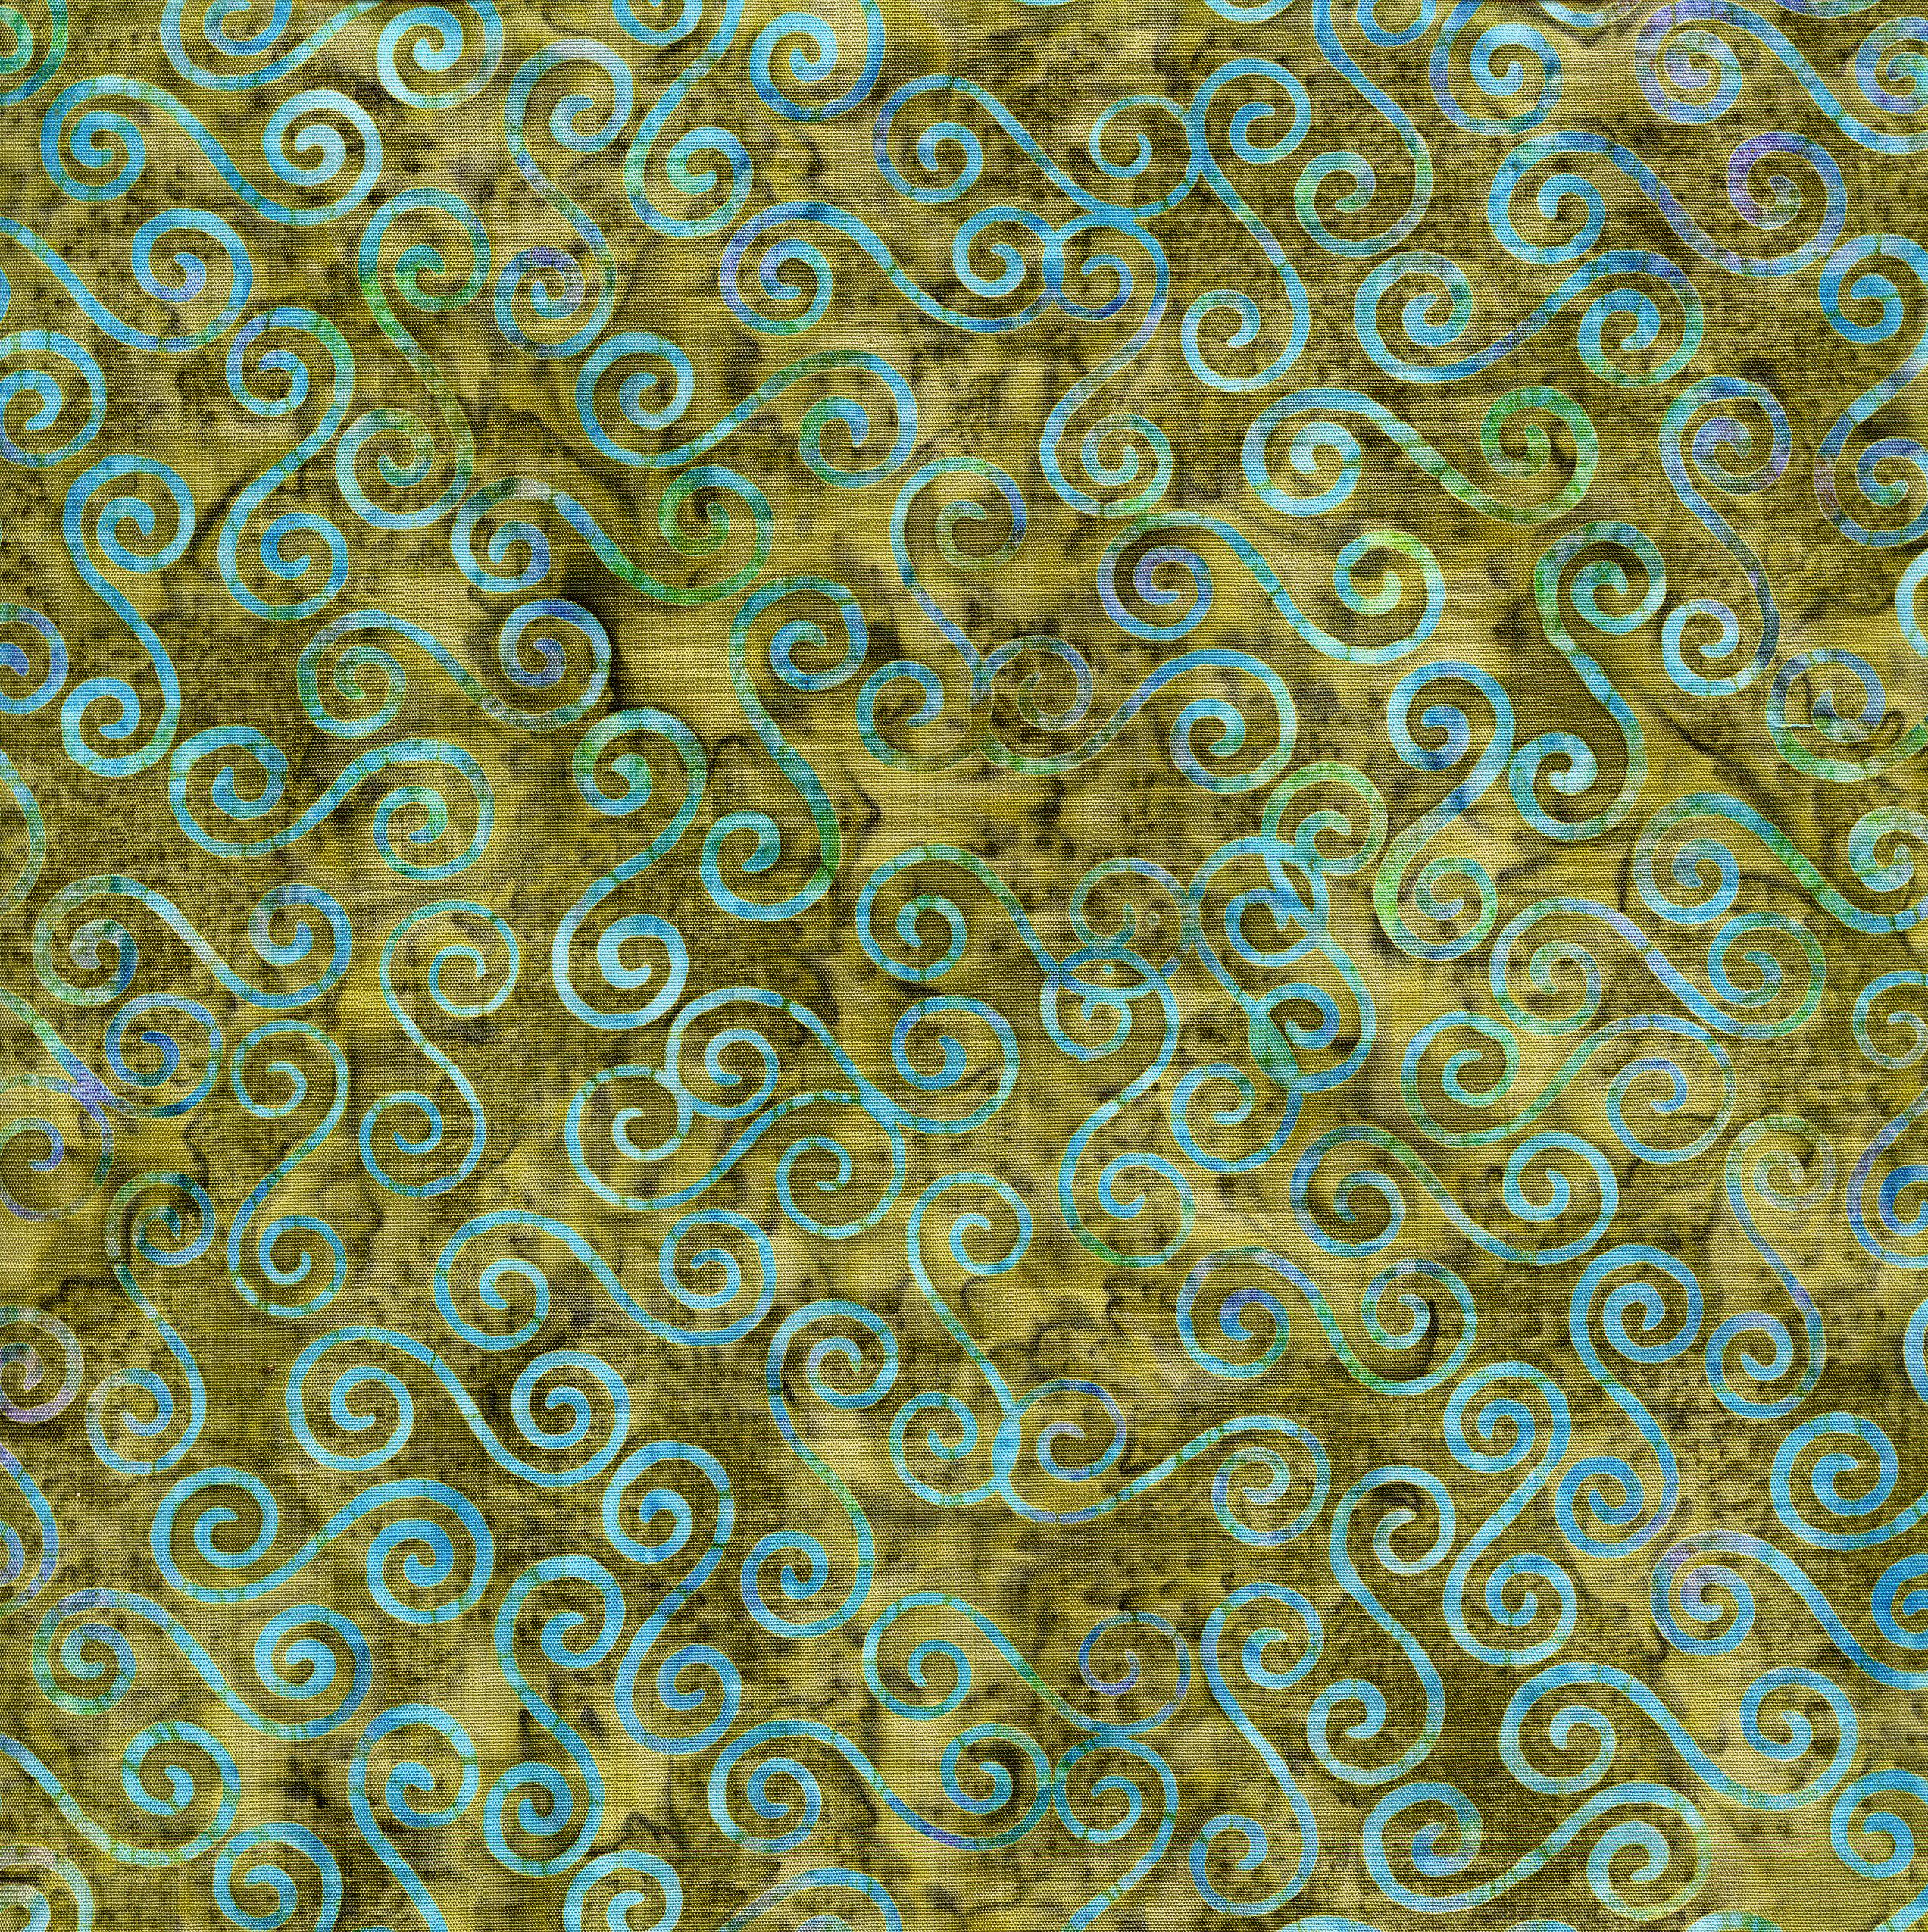 311804655 / Interlocking Swirl -Olive